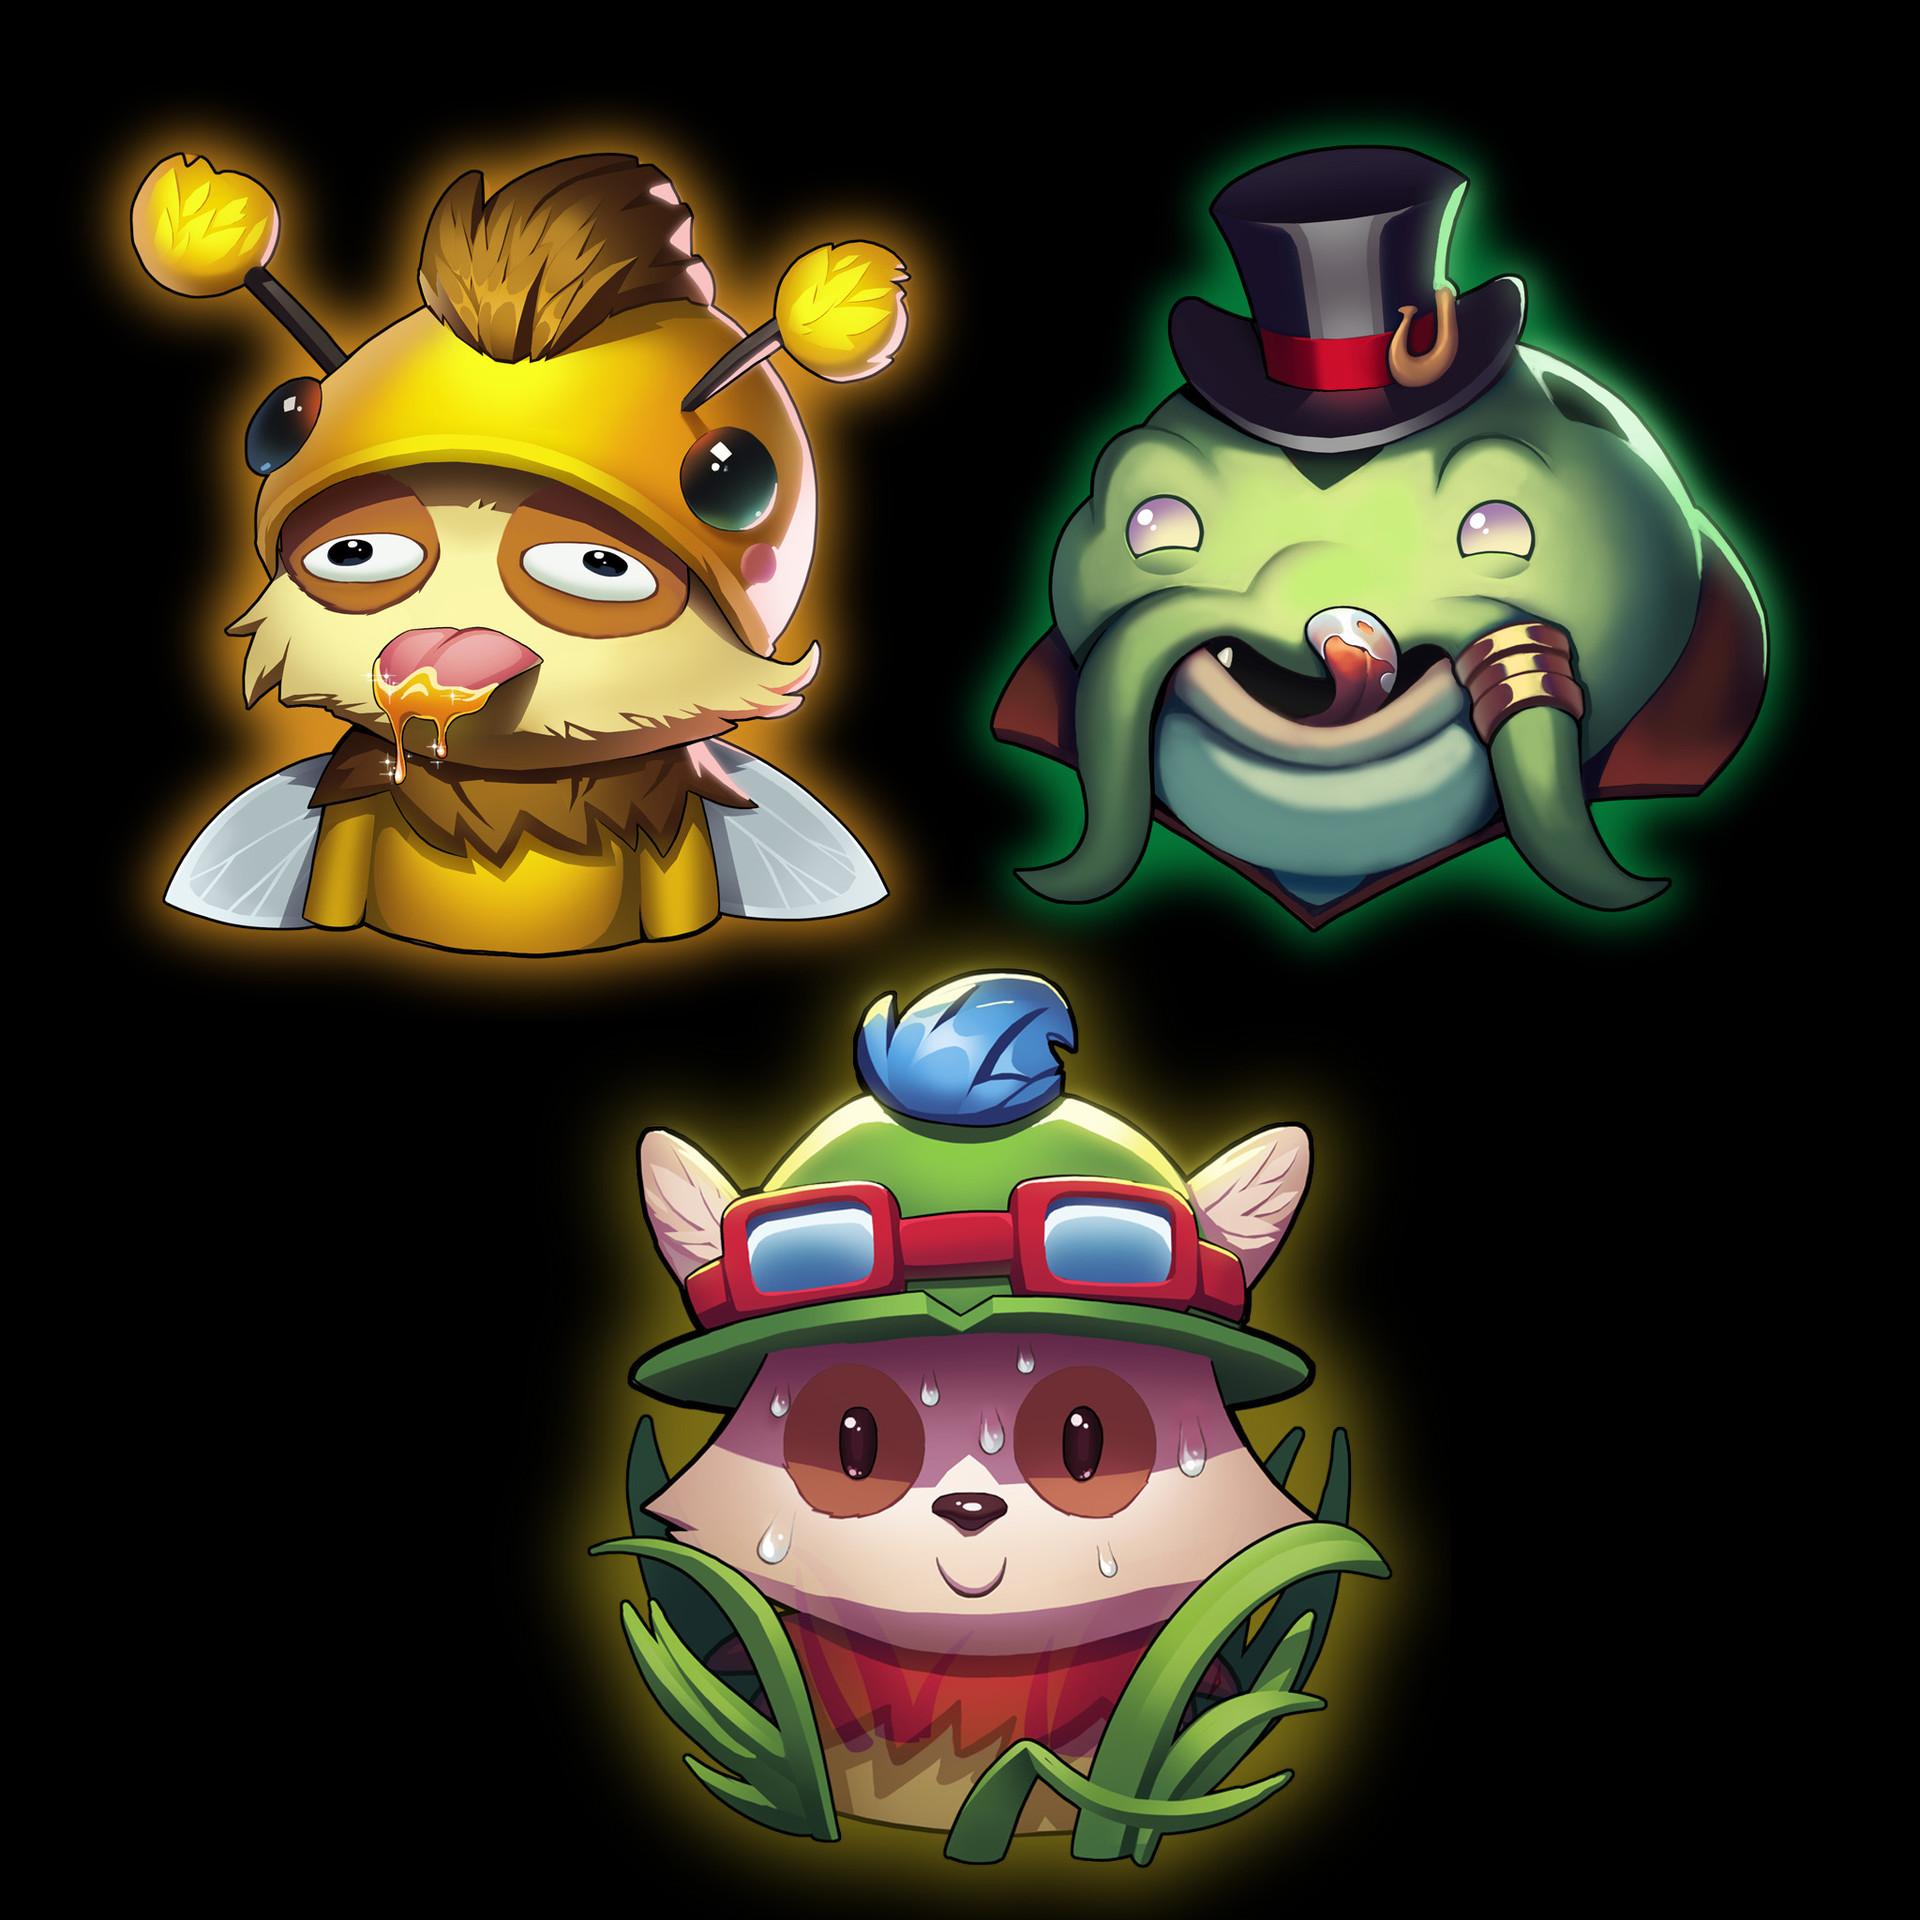 ArtStation - League of Legends Fan Contest Emotes, Leon Ropeter